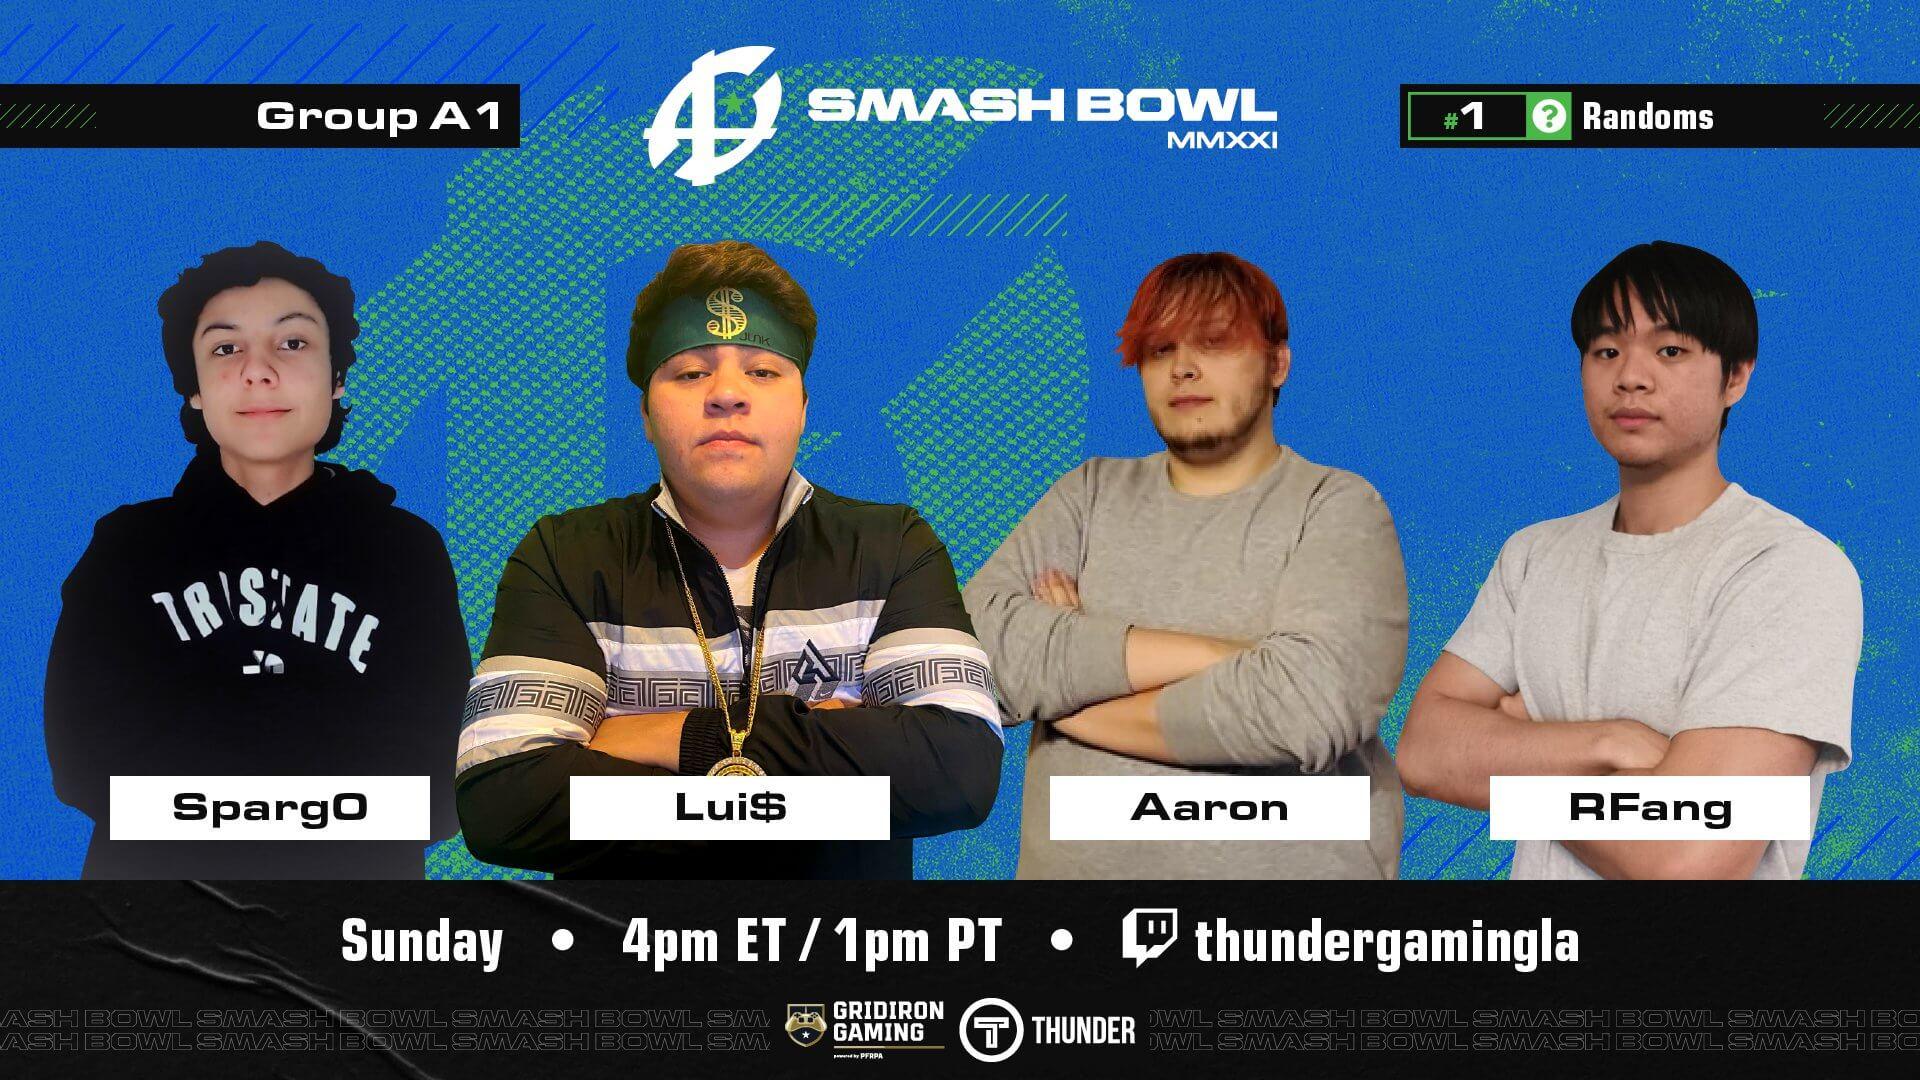 Smash Bowl MMXXI Week One Summary & Highlights